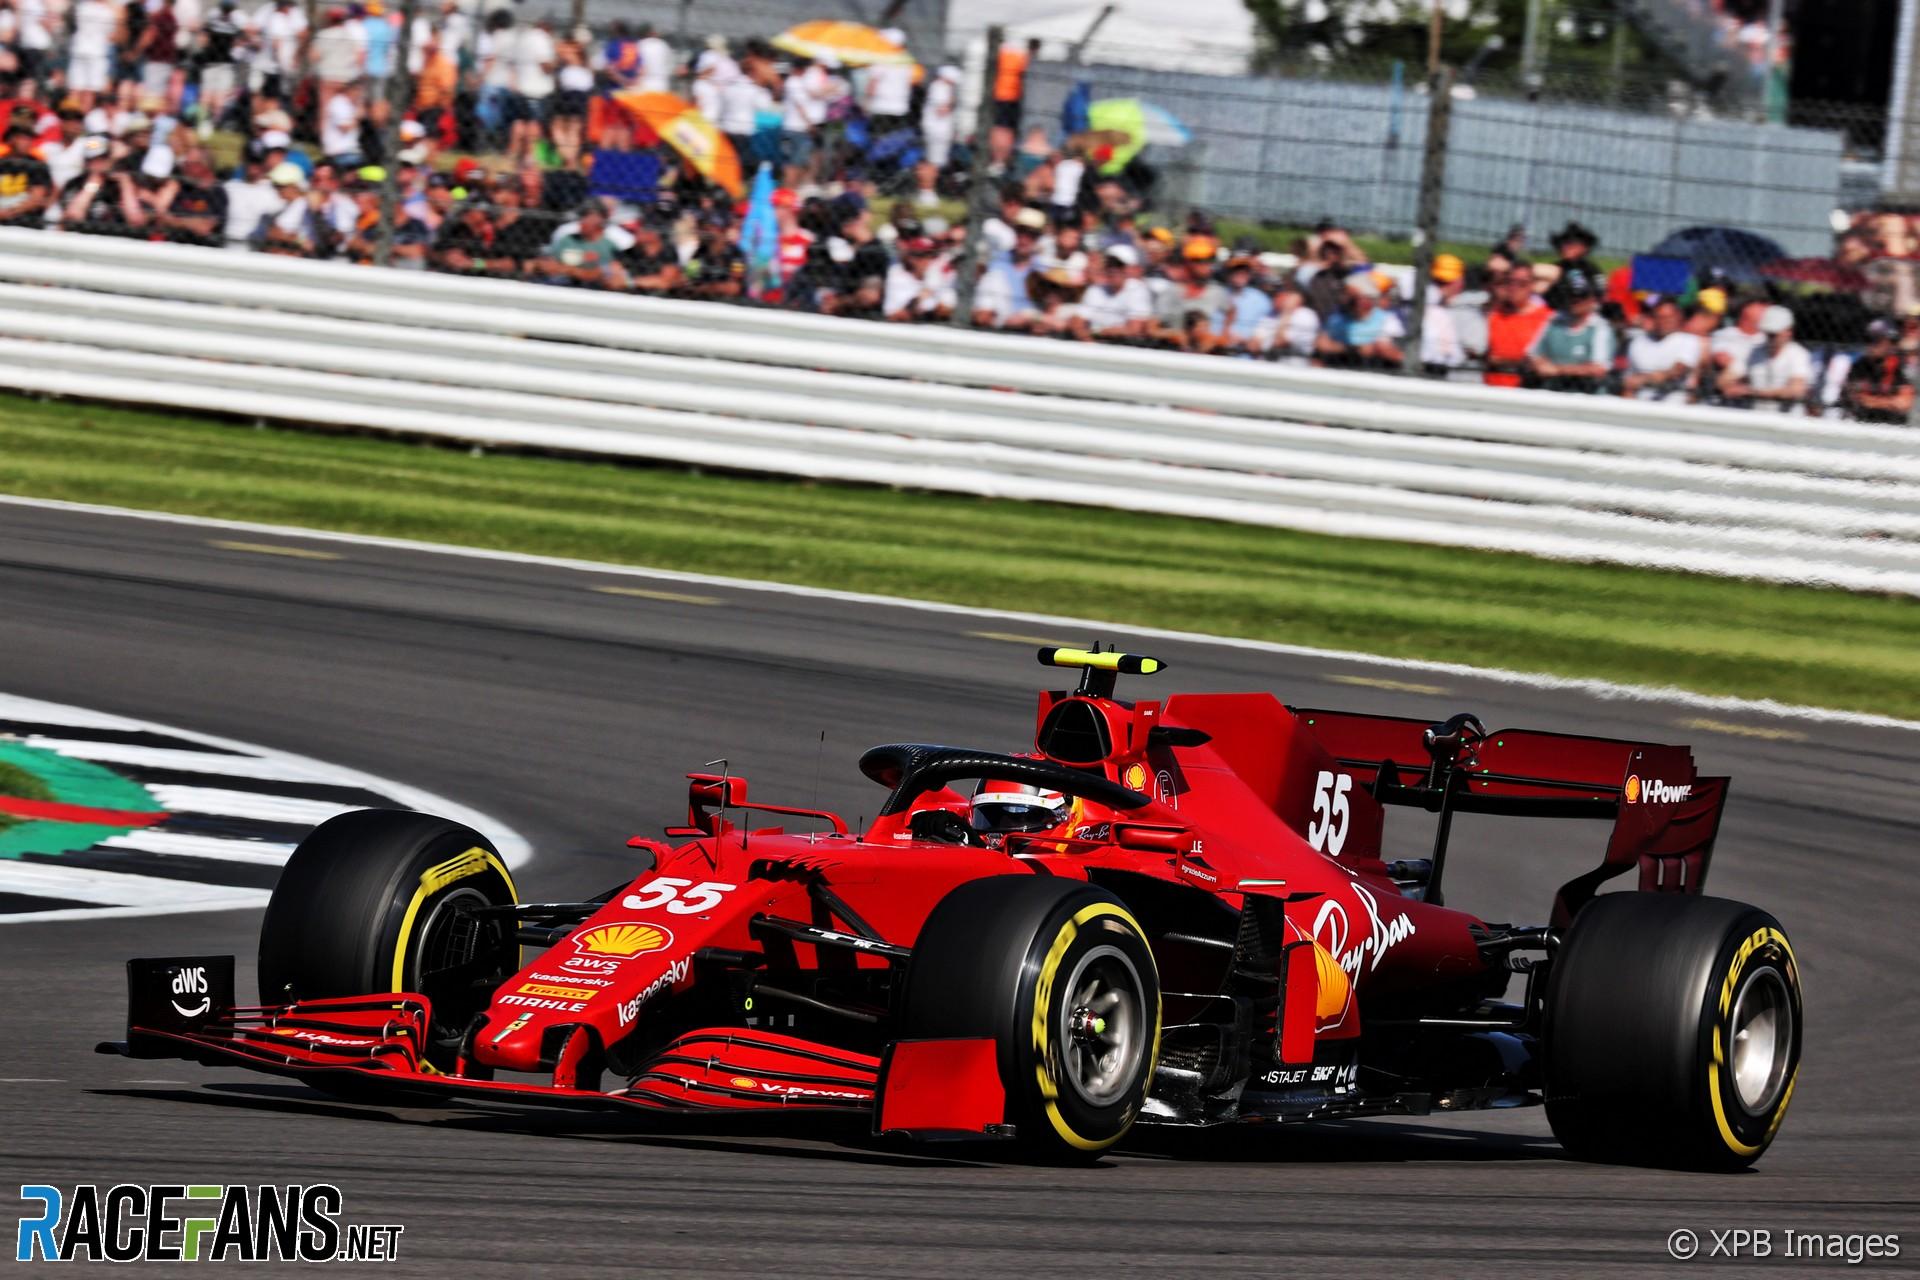 Carlos Sainz Jnr, Ferrari, Silverstone, 2021